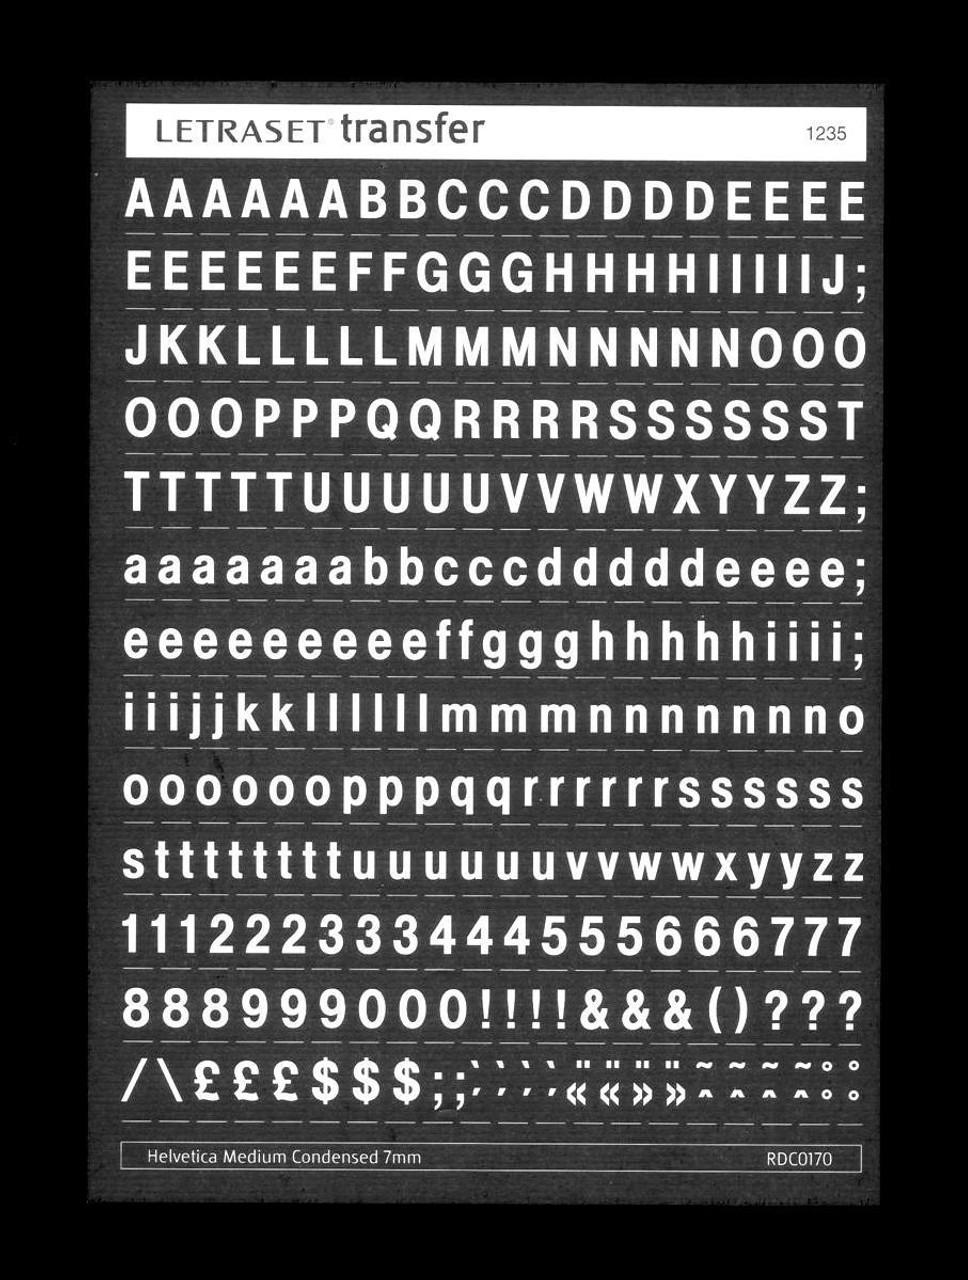 7mm, Helvetica Medium Condensed , White , Letraset, RDC0170